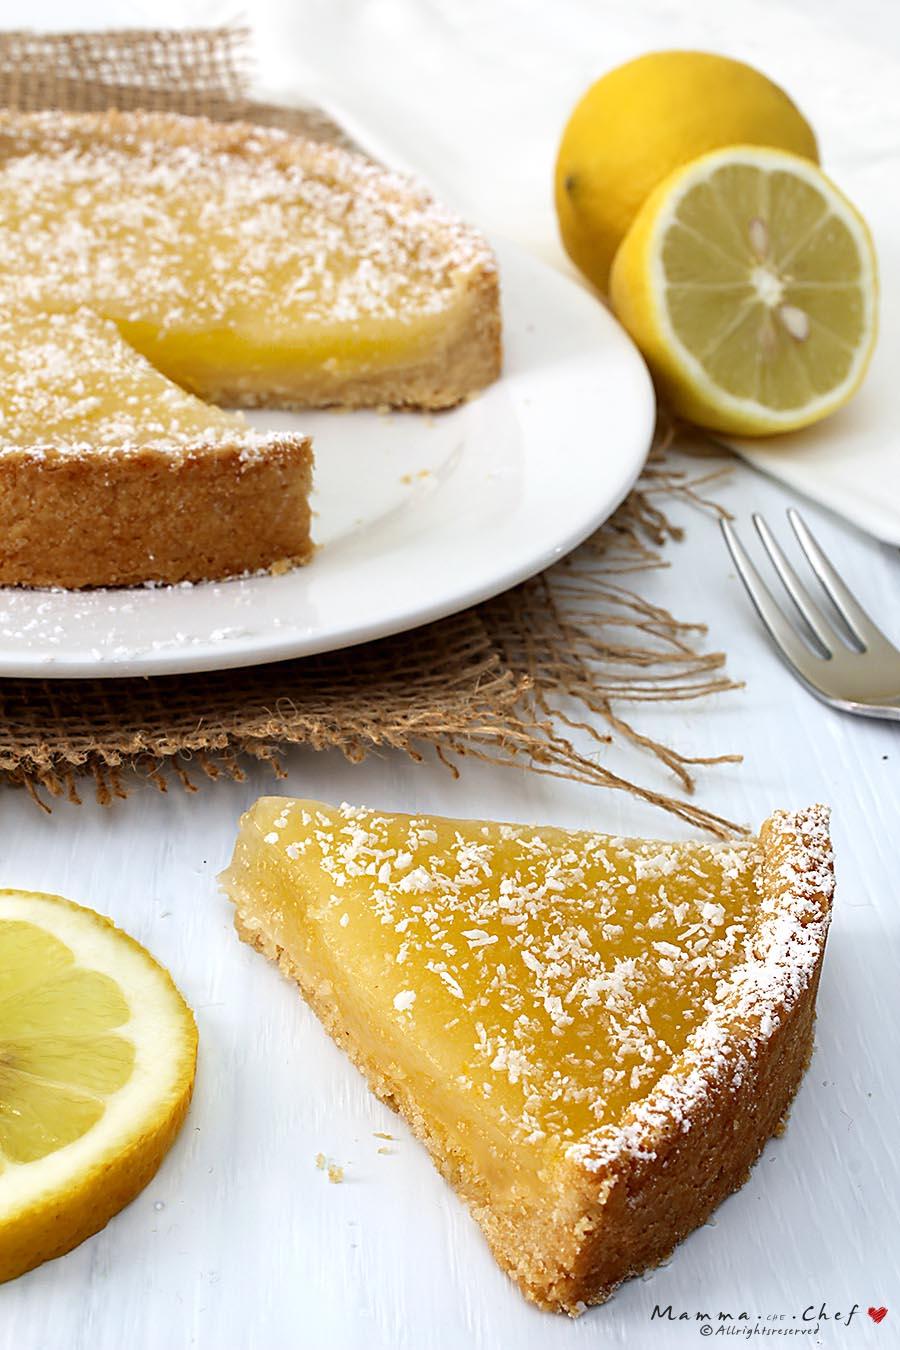 Crostata-al-limone-2a.jpg